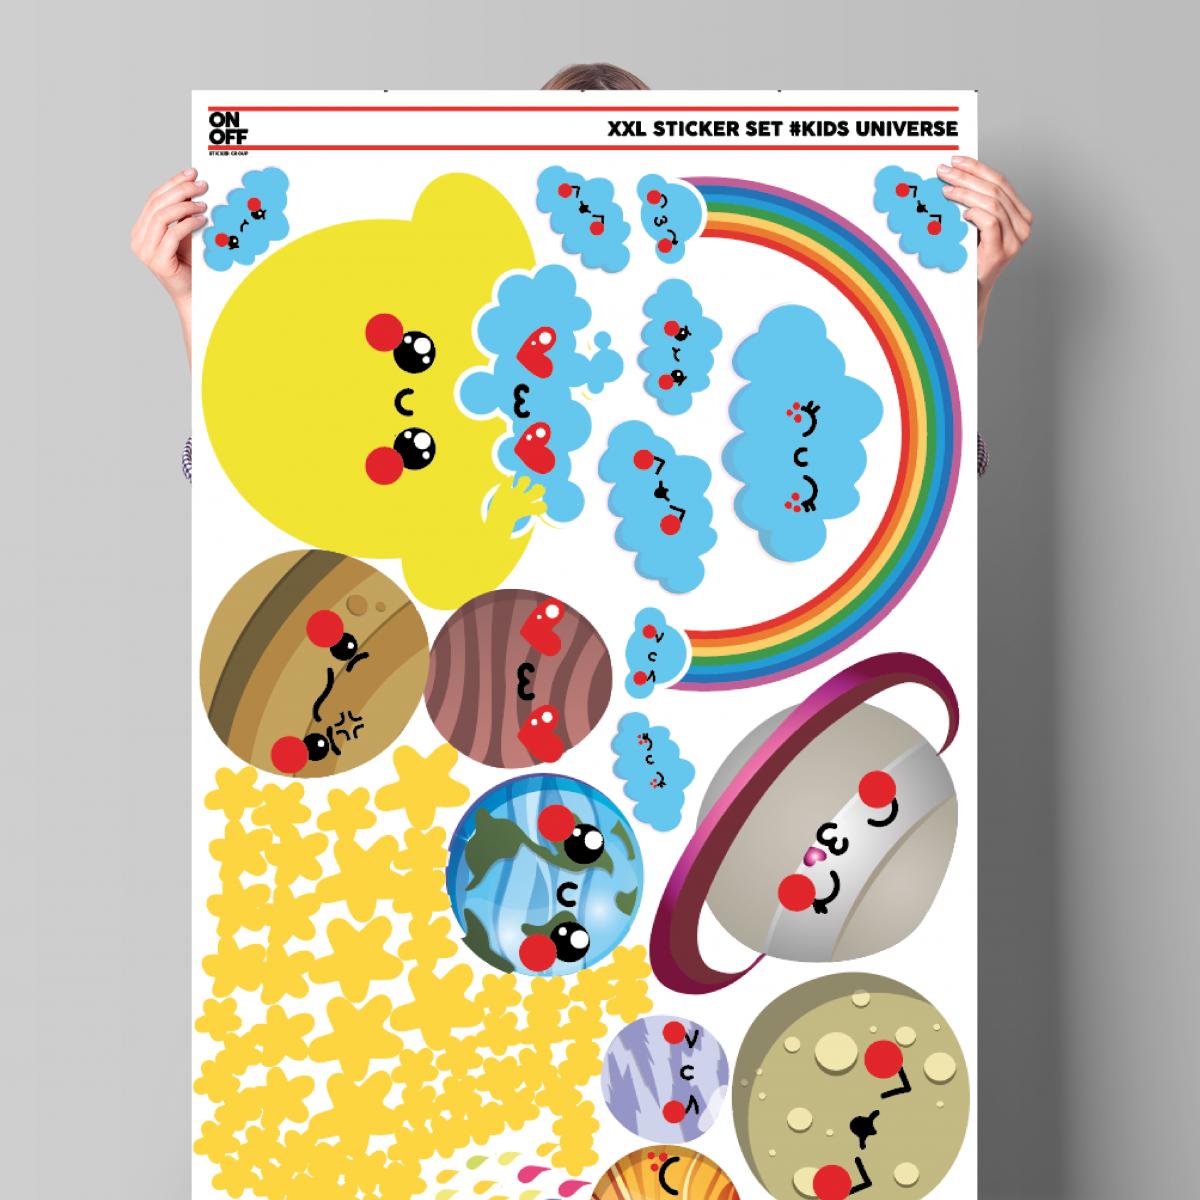 XXL-Sticker-kids-universe